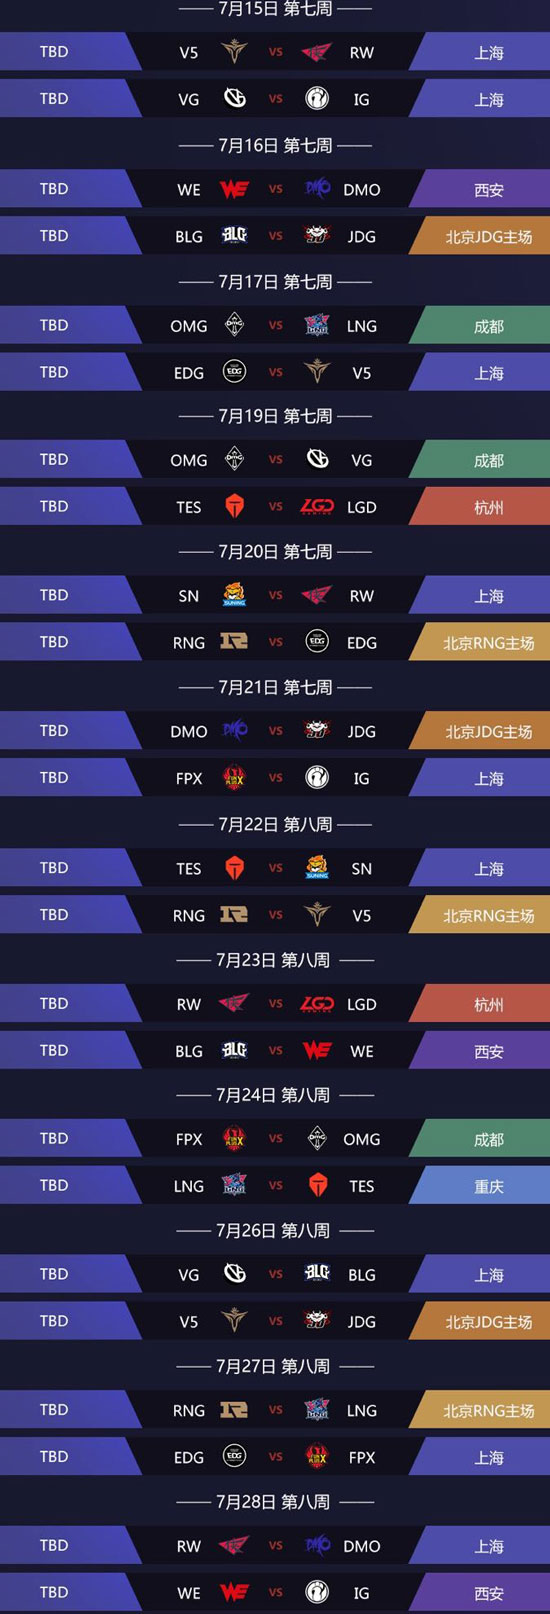 《LOL》LPL夏季赛2019赛程表